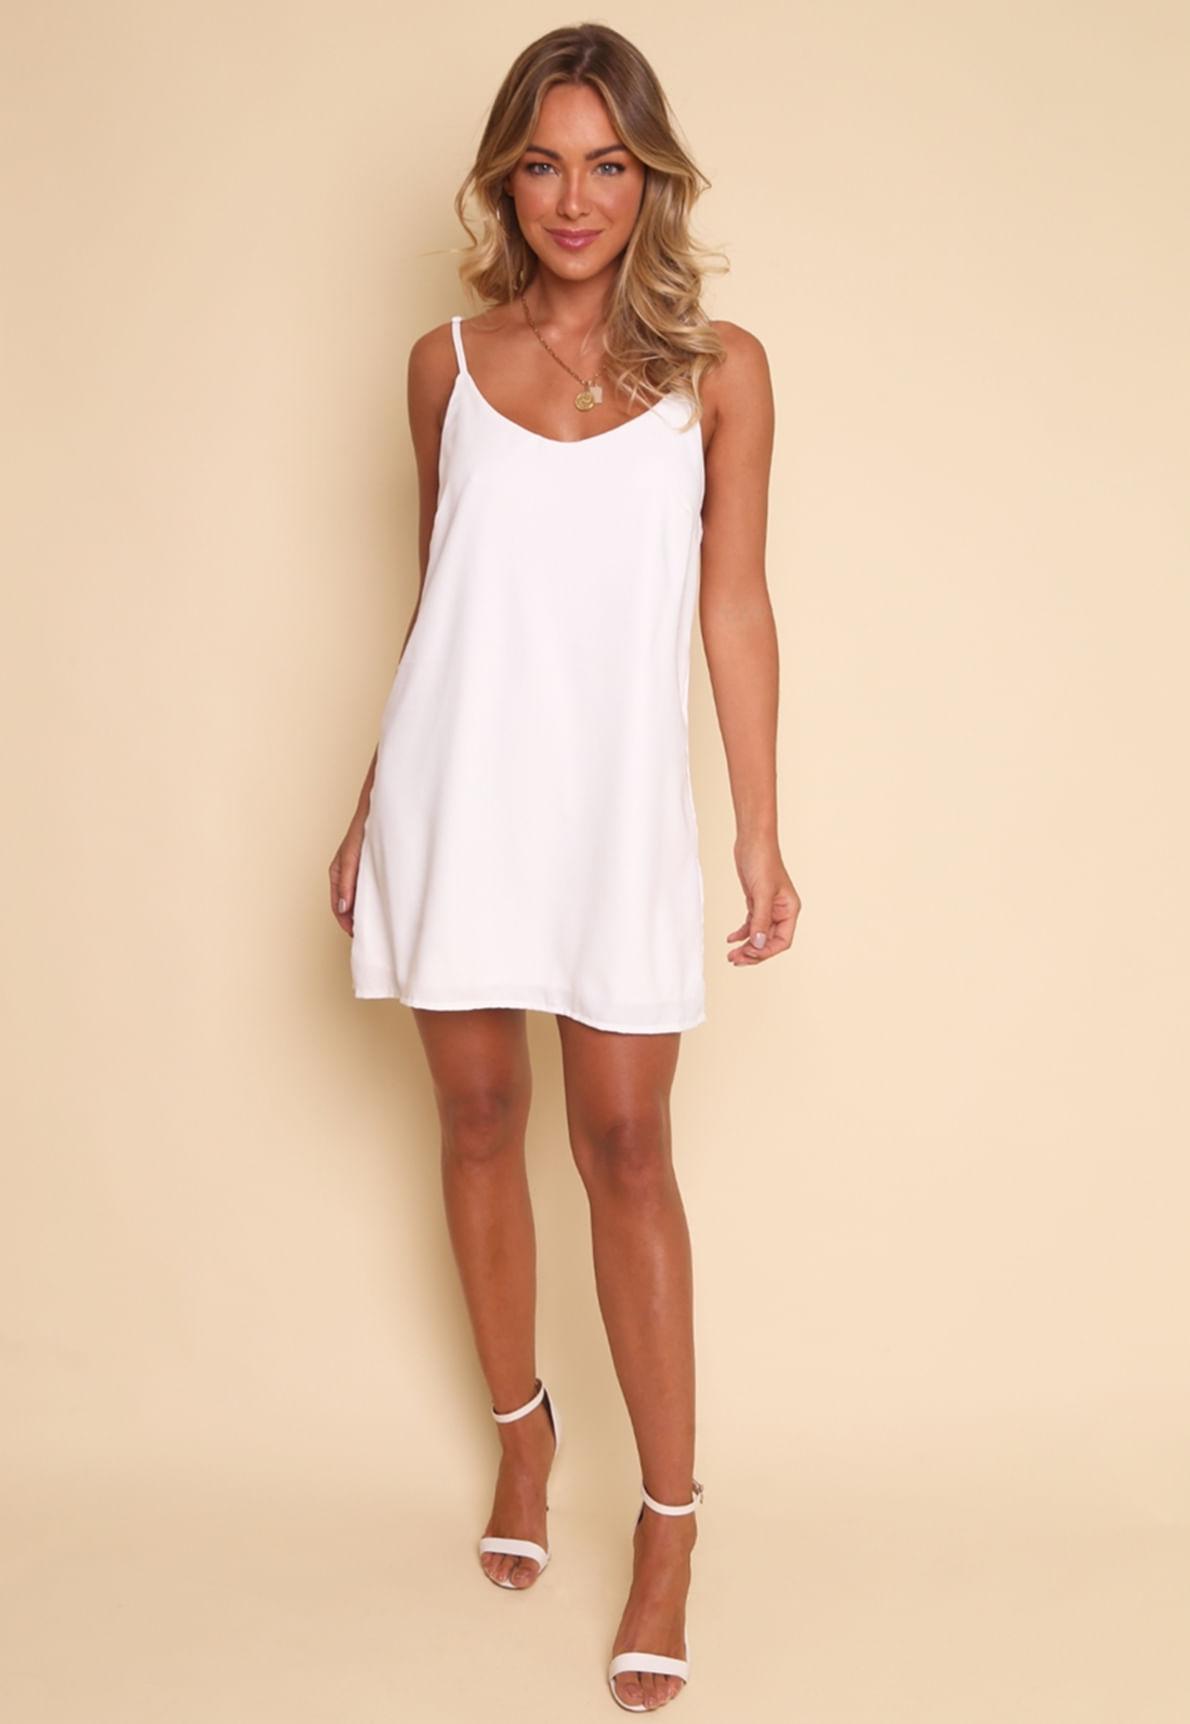 30513-vestido-soltinho-off-white-noronha-mundo-lolita-01.jpg